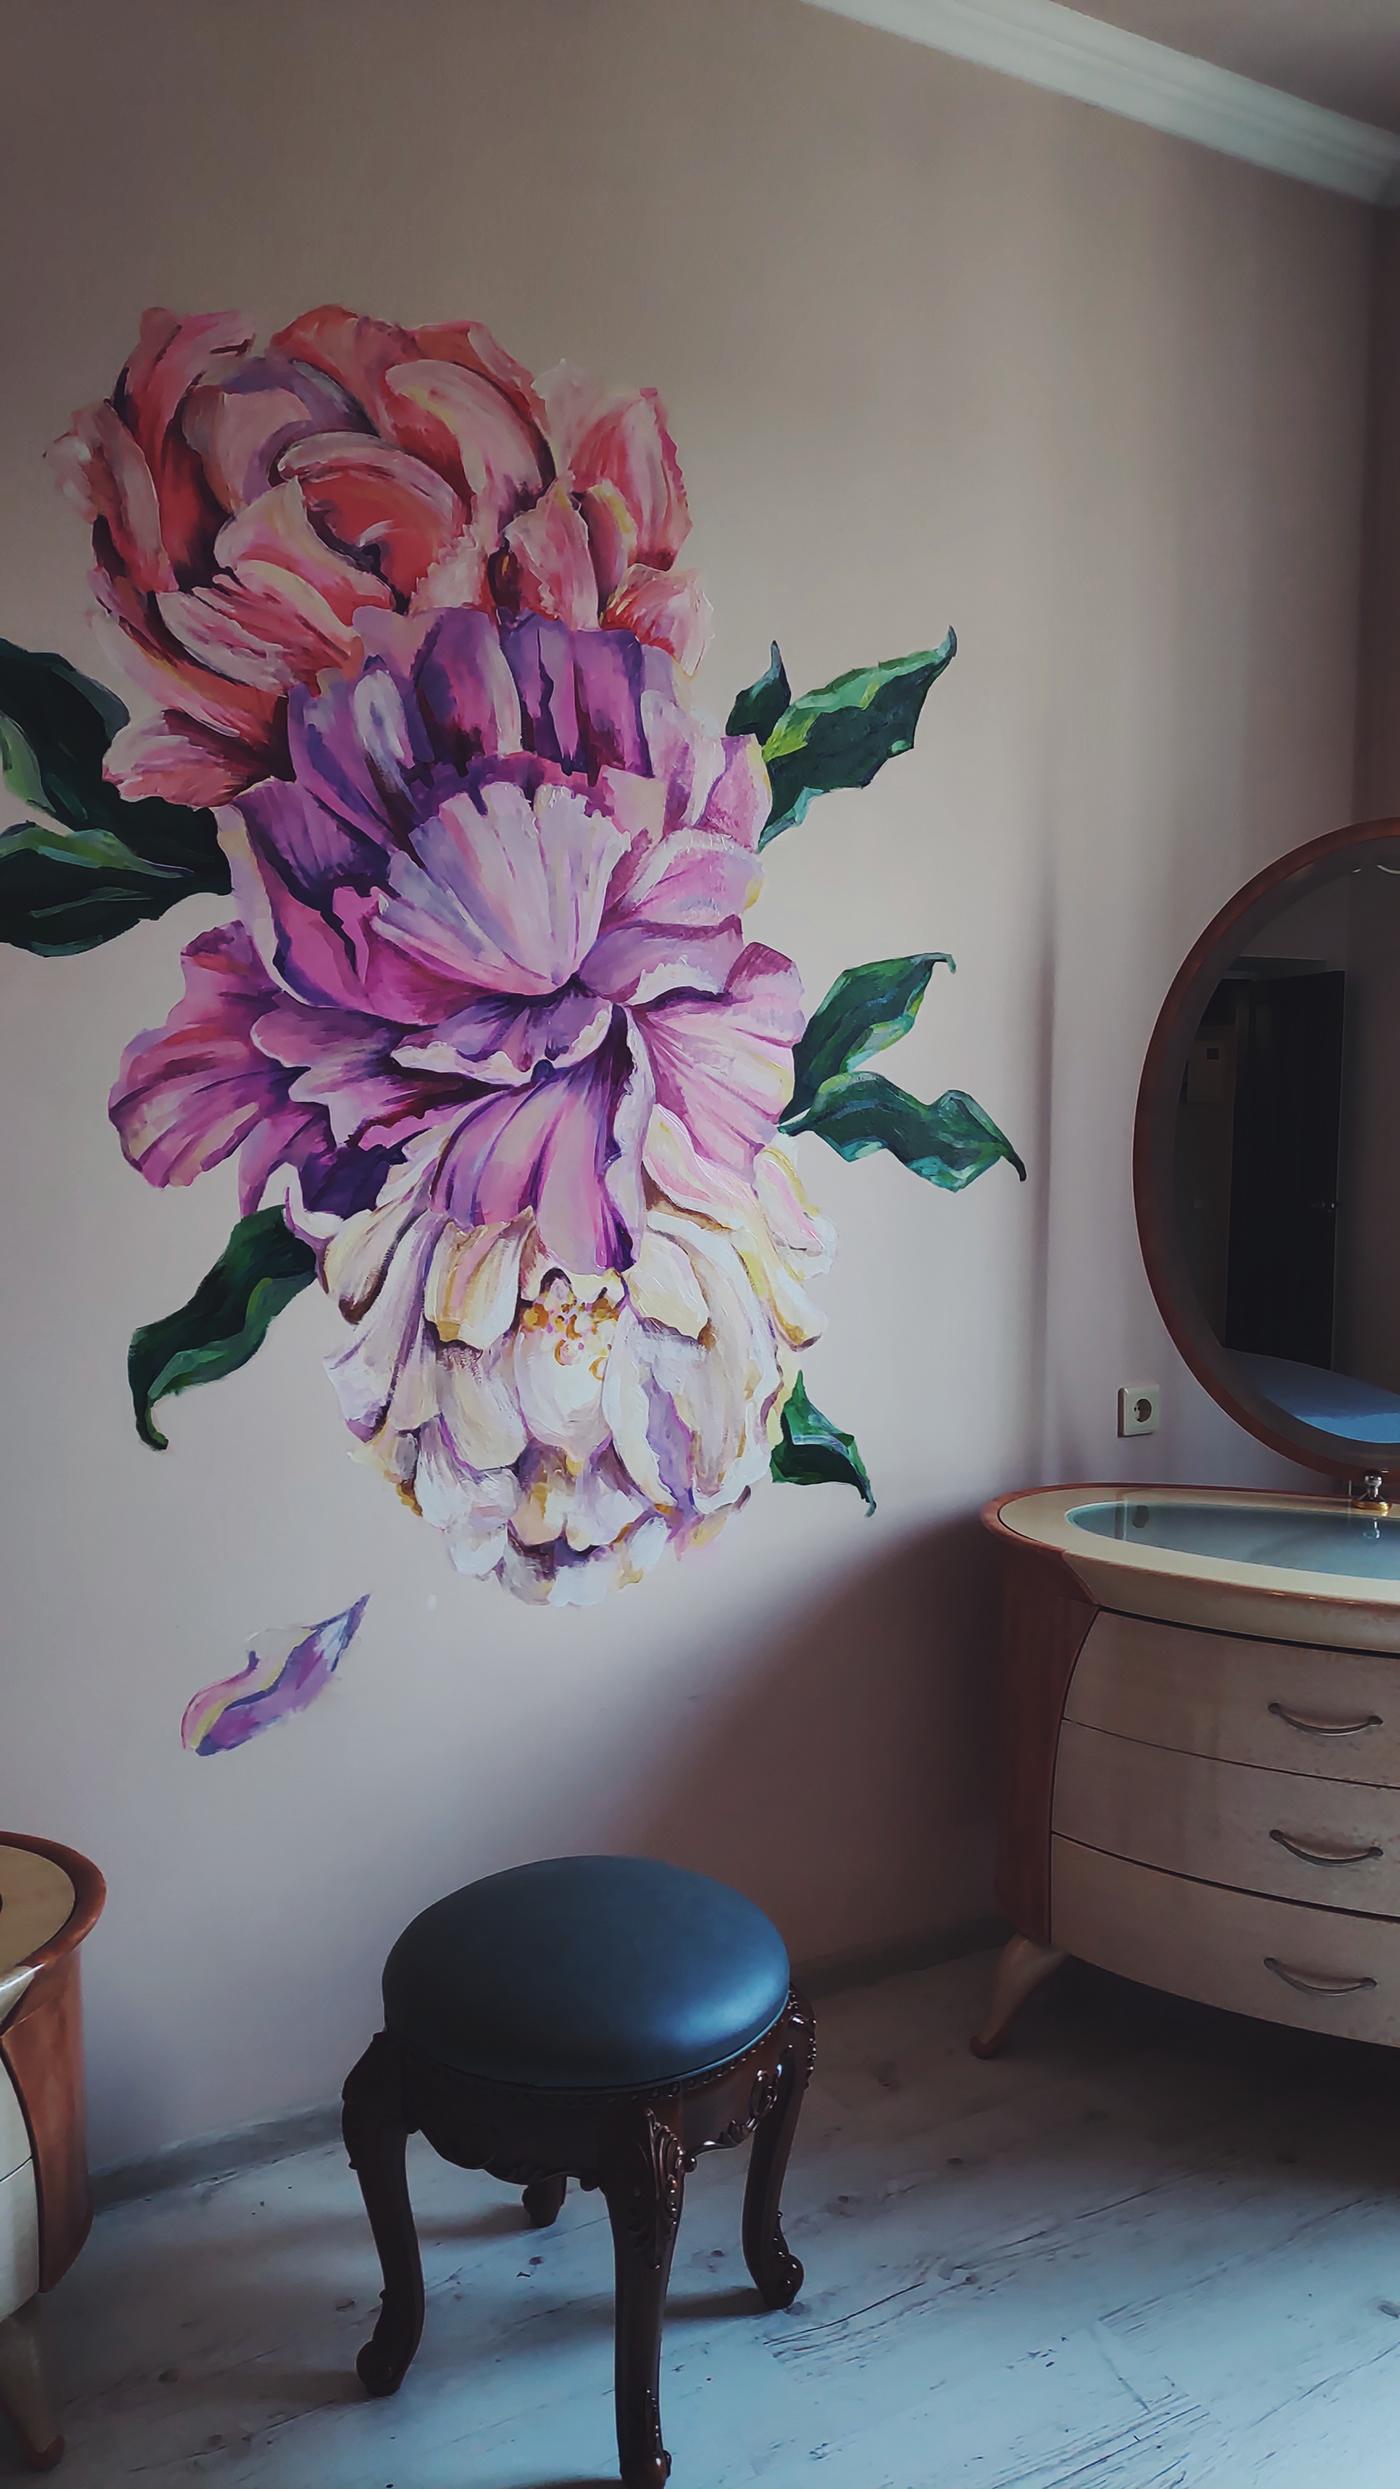 art Flowers acrylic painting Interior design decoration ideas